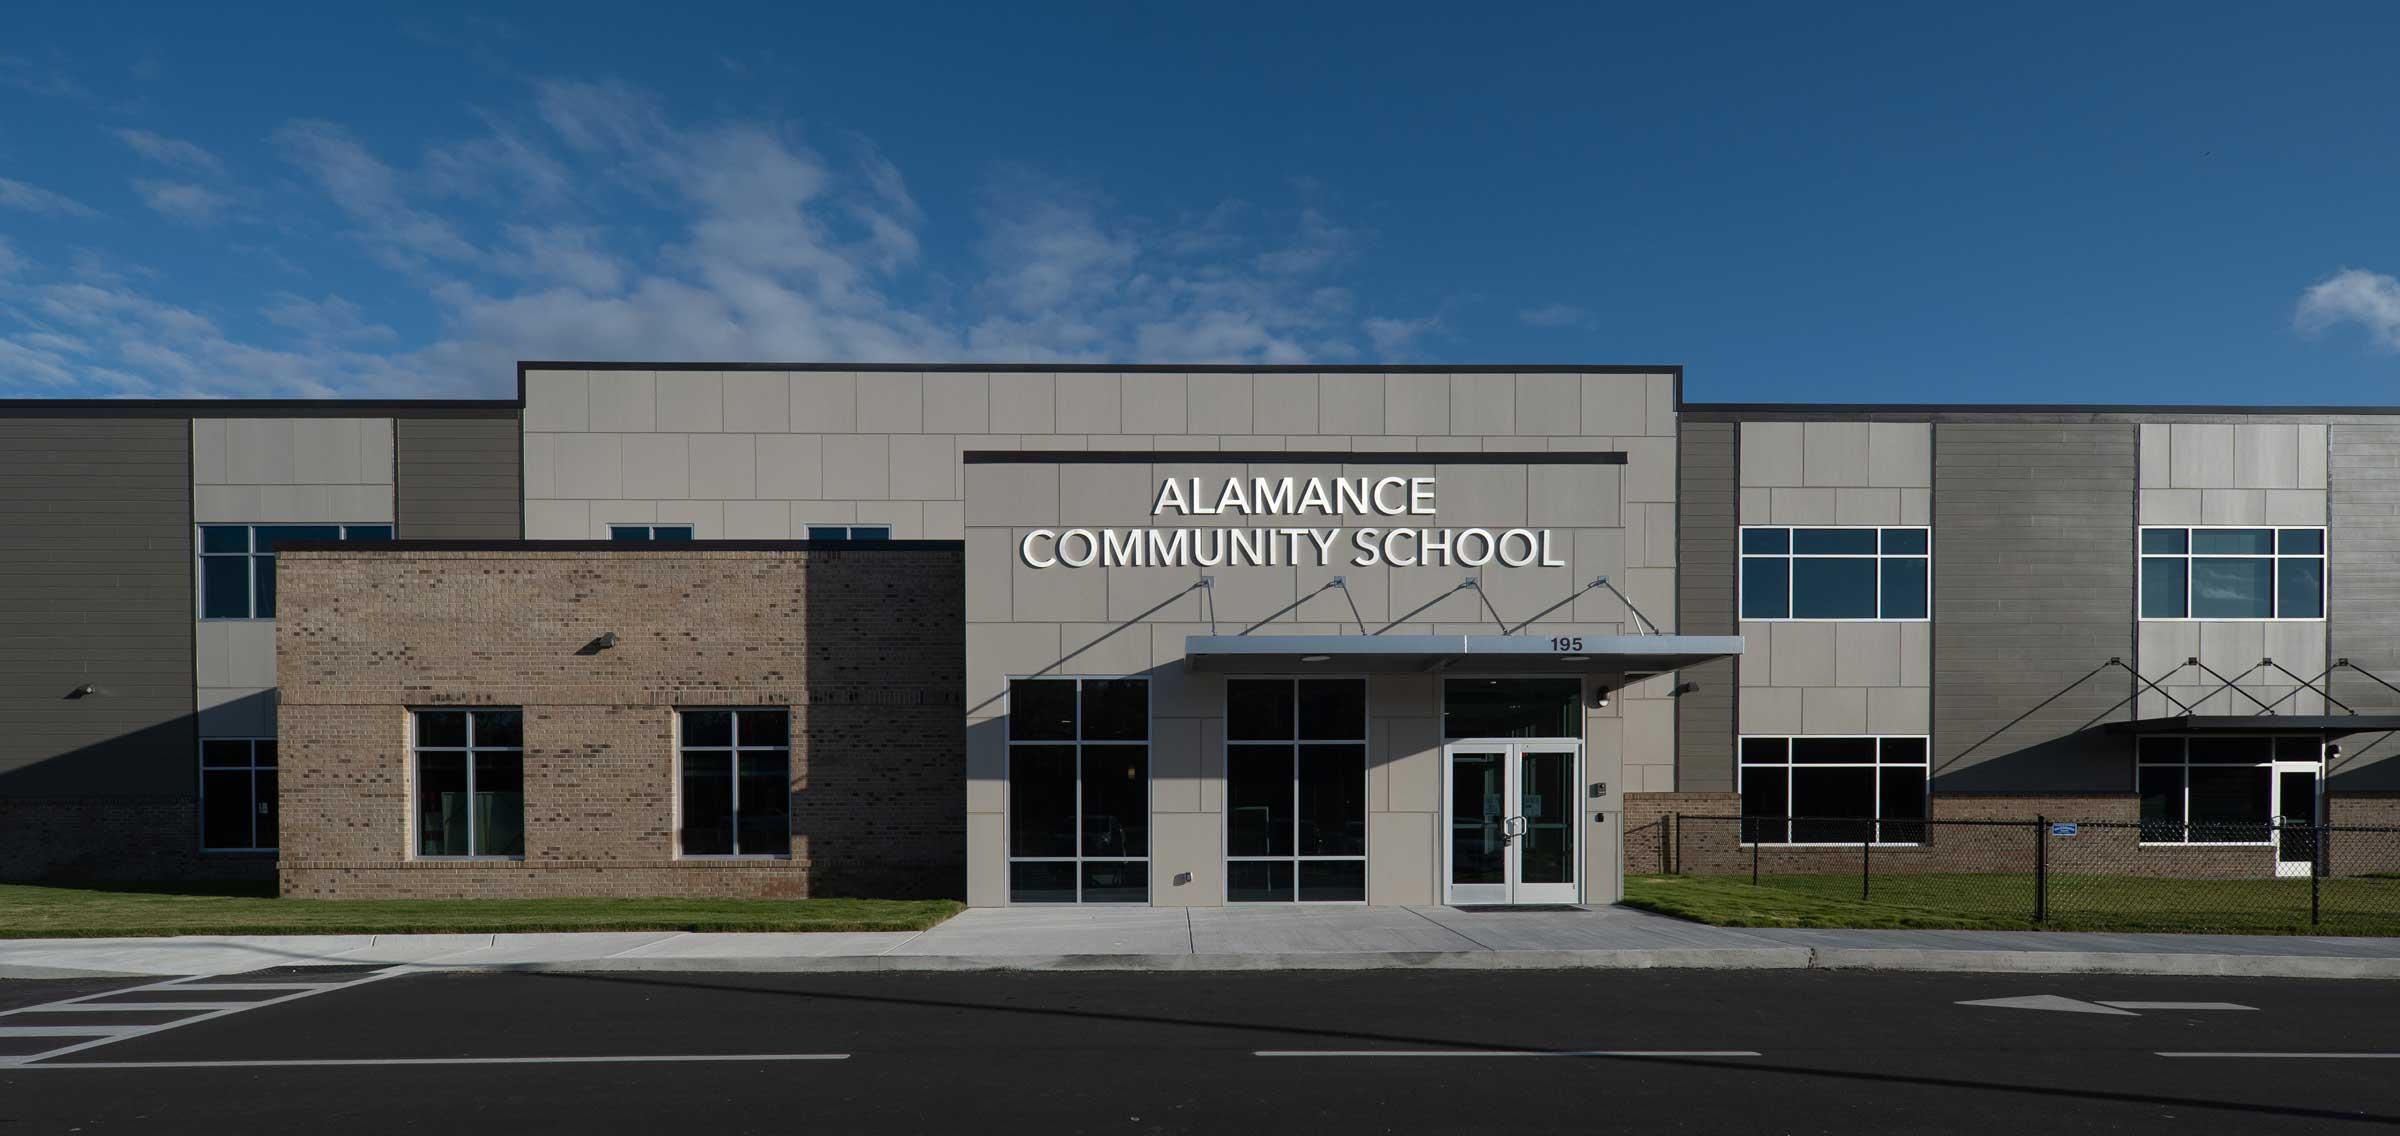 Alamance County School in Graham, NC - glass installation by Interstate Glass & Glazing